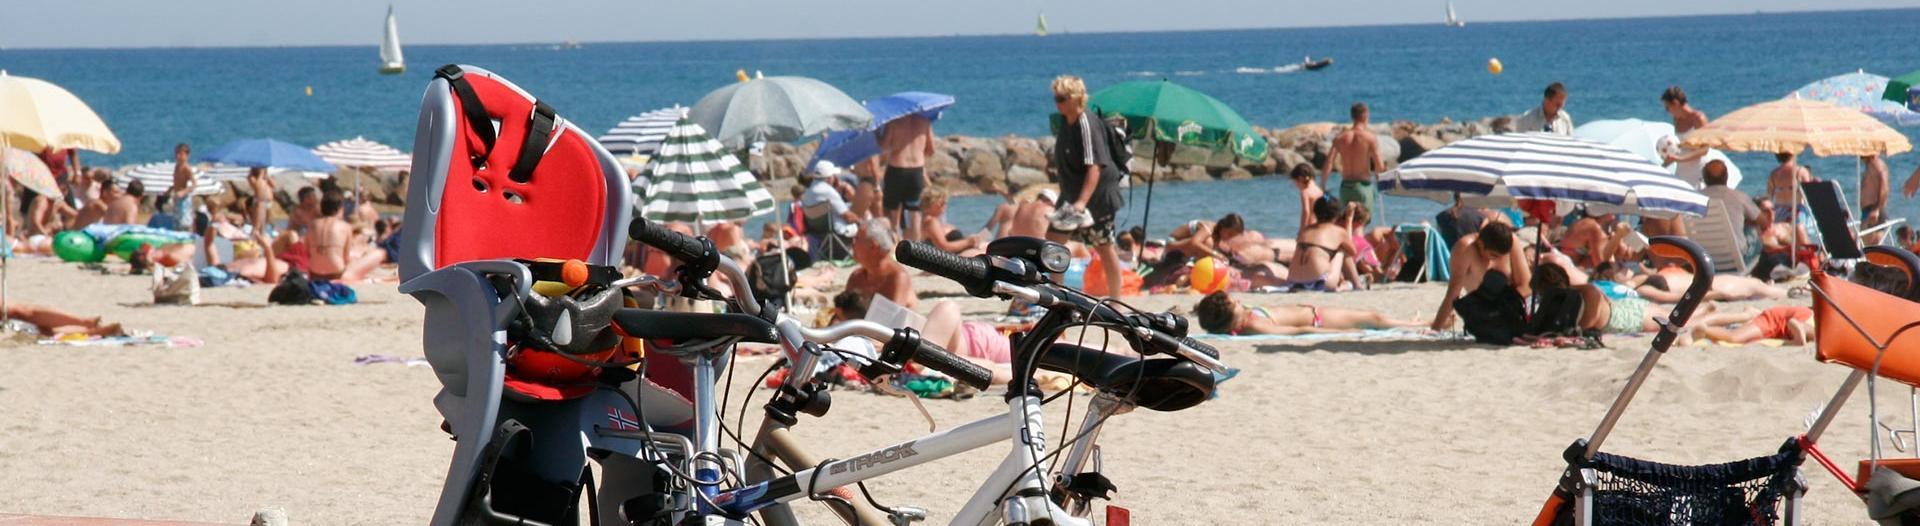 Slider-plage-languedoc